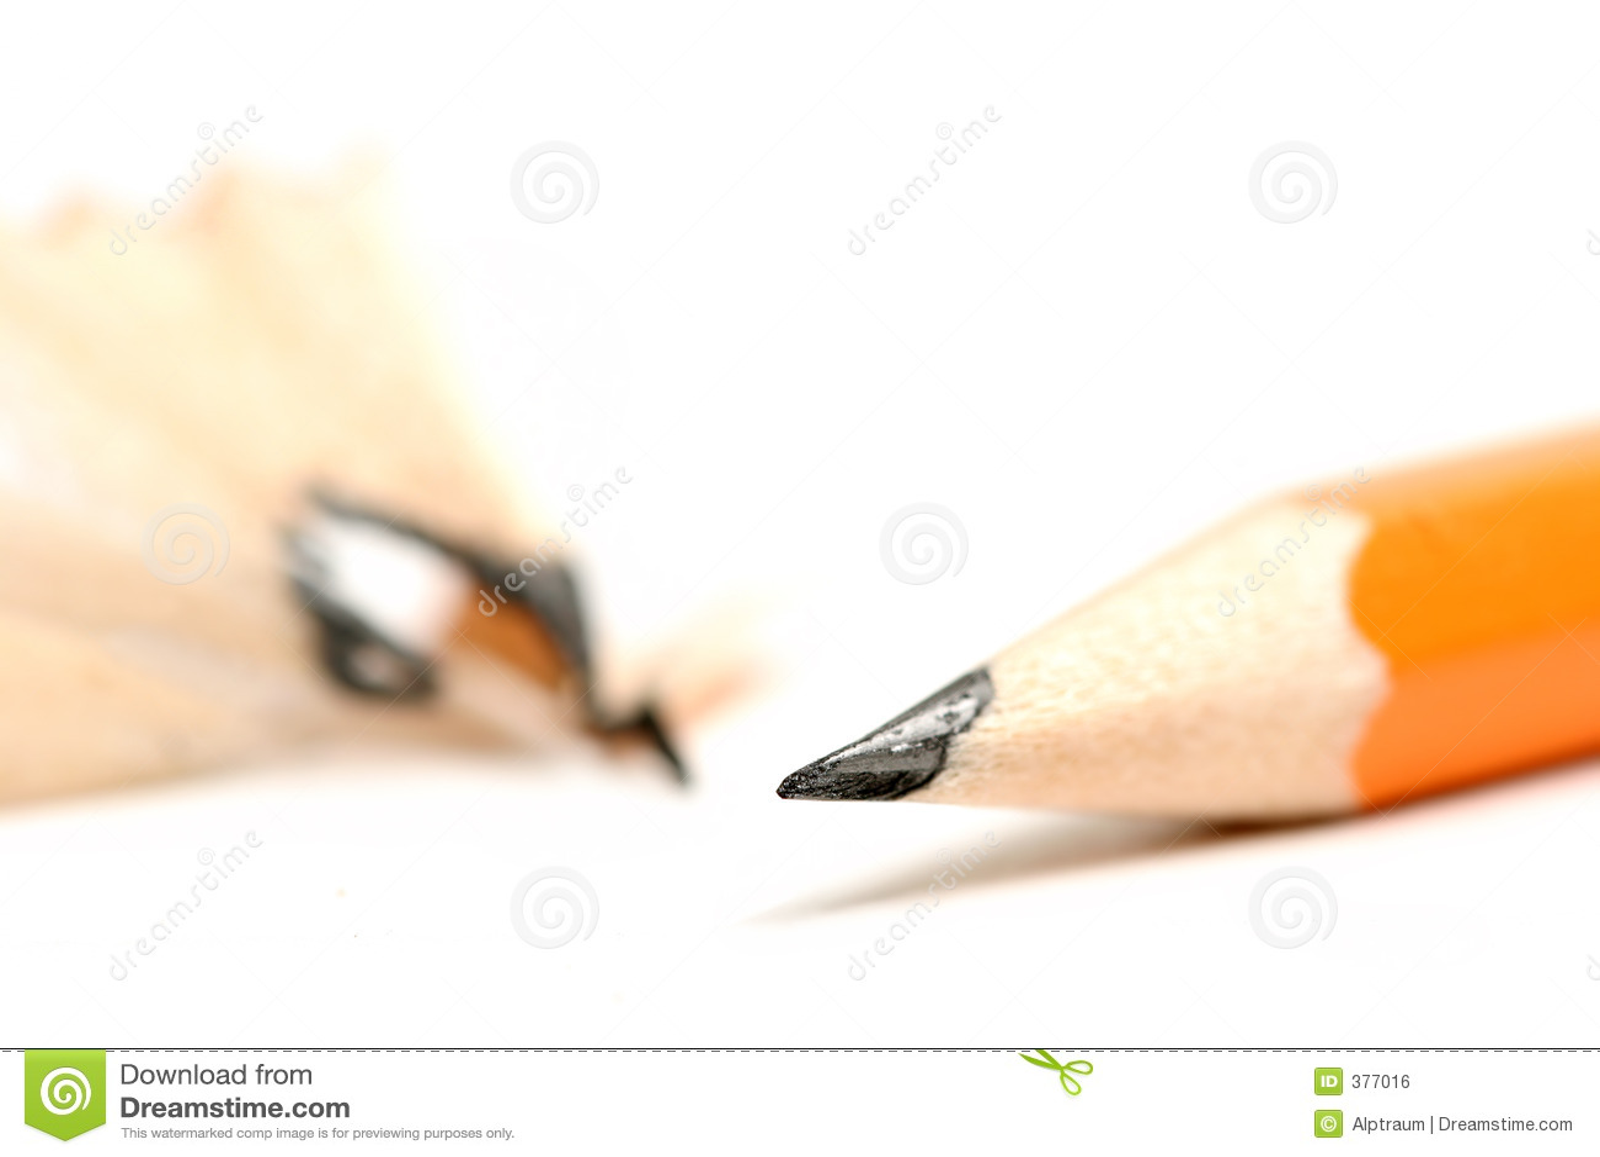 Lápis sharpened